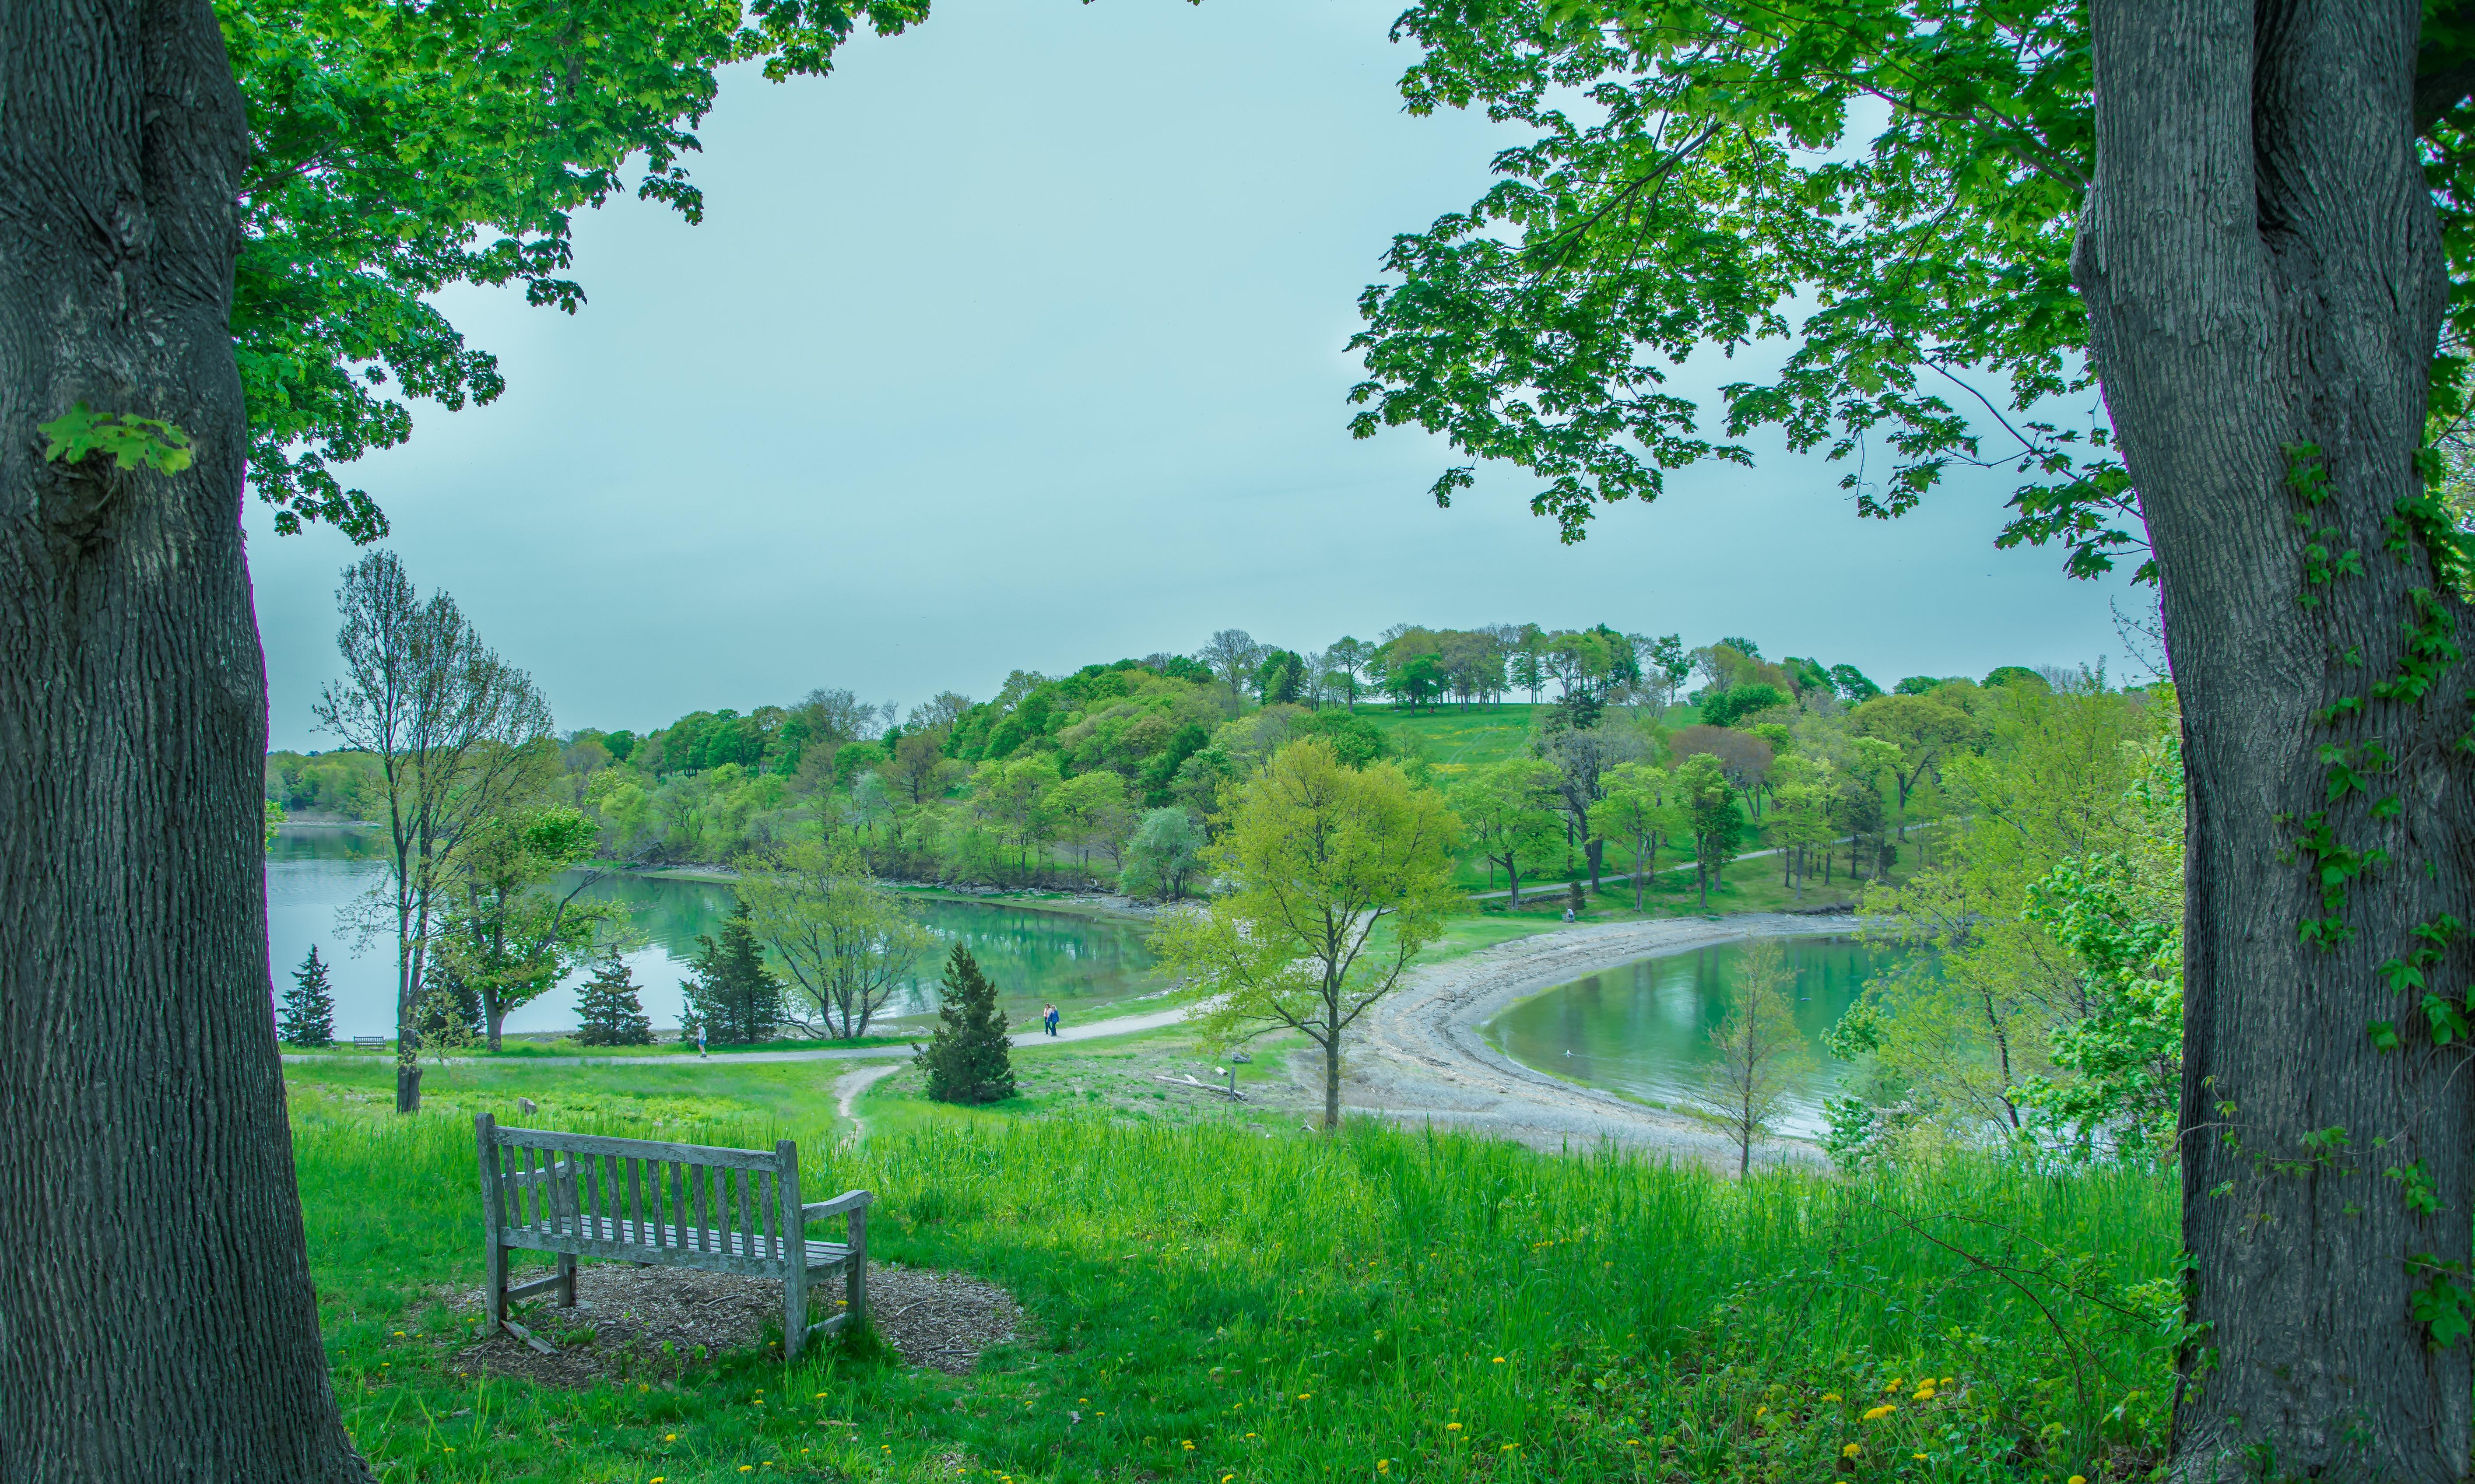 обои Новая Англия, скамейка, клены, Массачусетс картинки фото